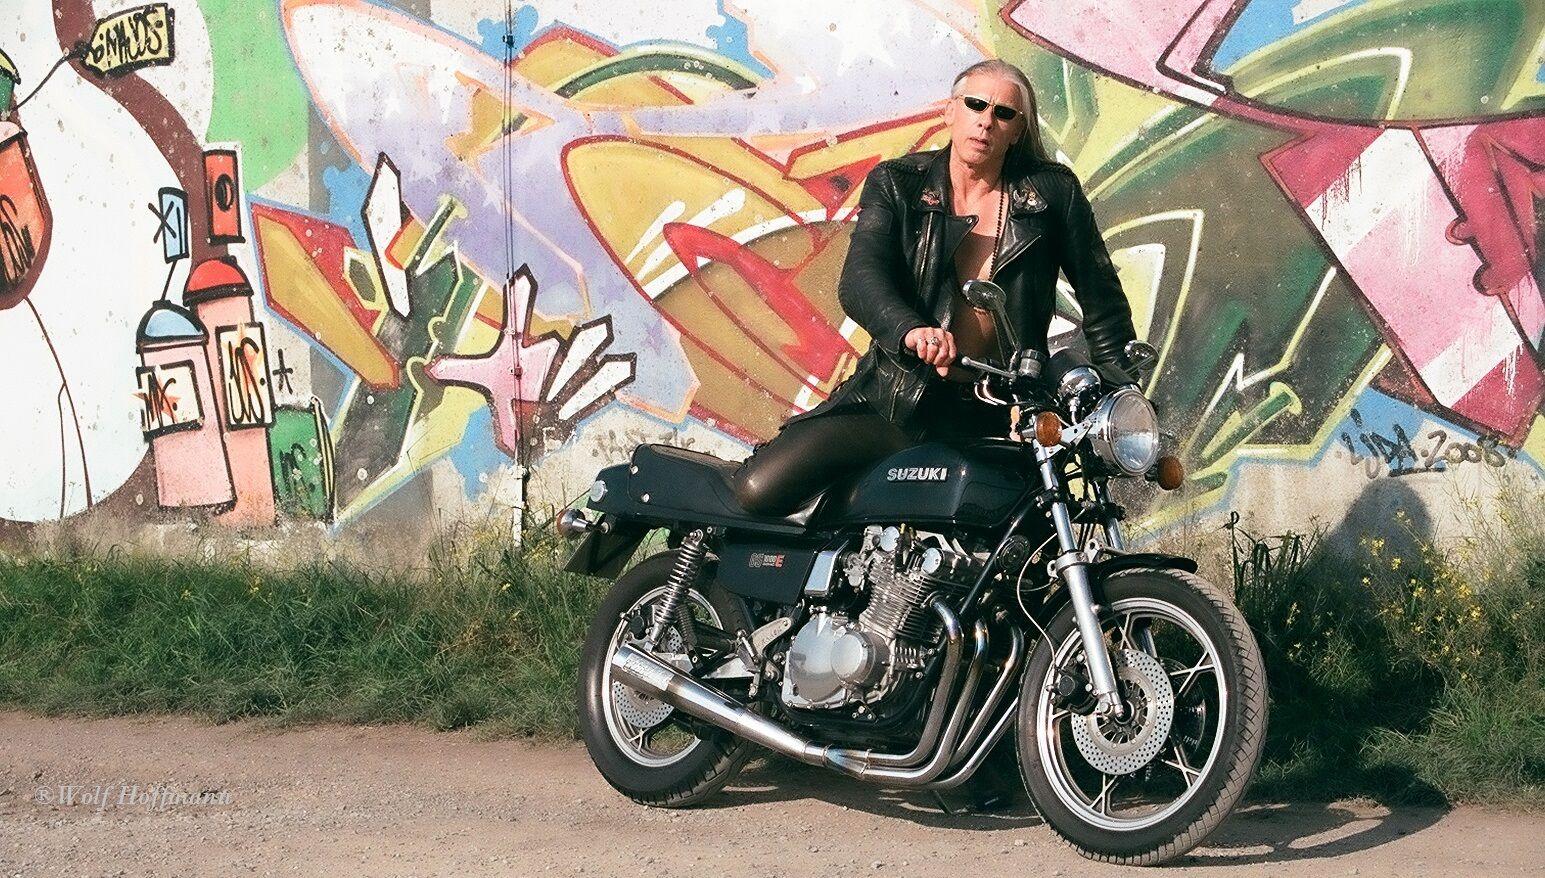 #Model #leather #shooting # #Leatherclothes #motorcycleclothing #Leisurewear #fashion #fashionweek  #lifstyle #mensfashion #bike #motorcyle #artphotography